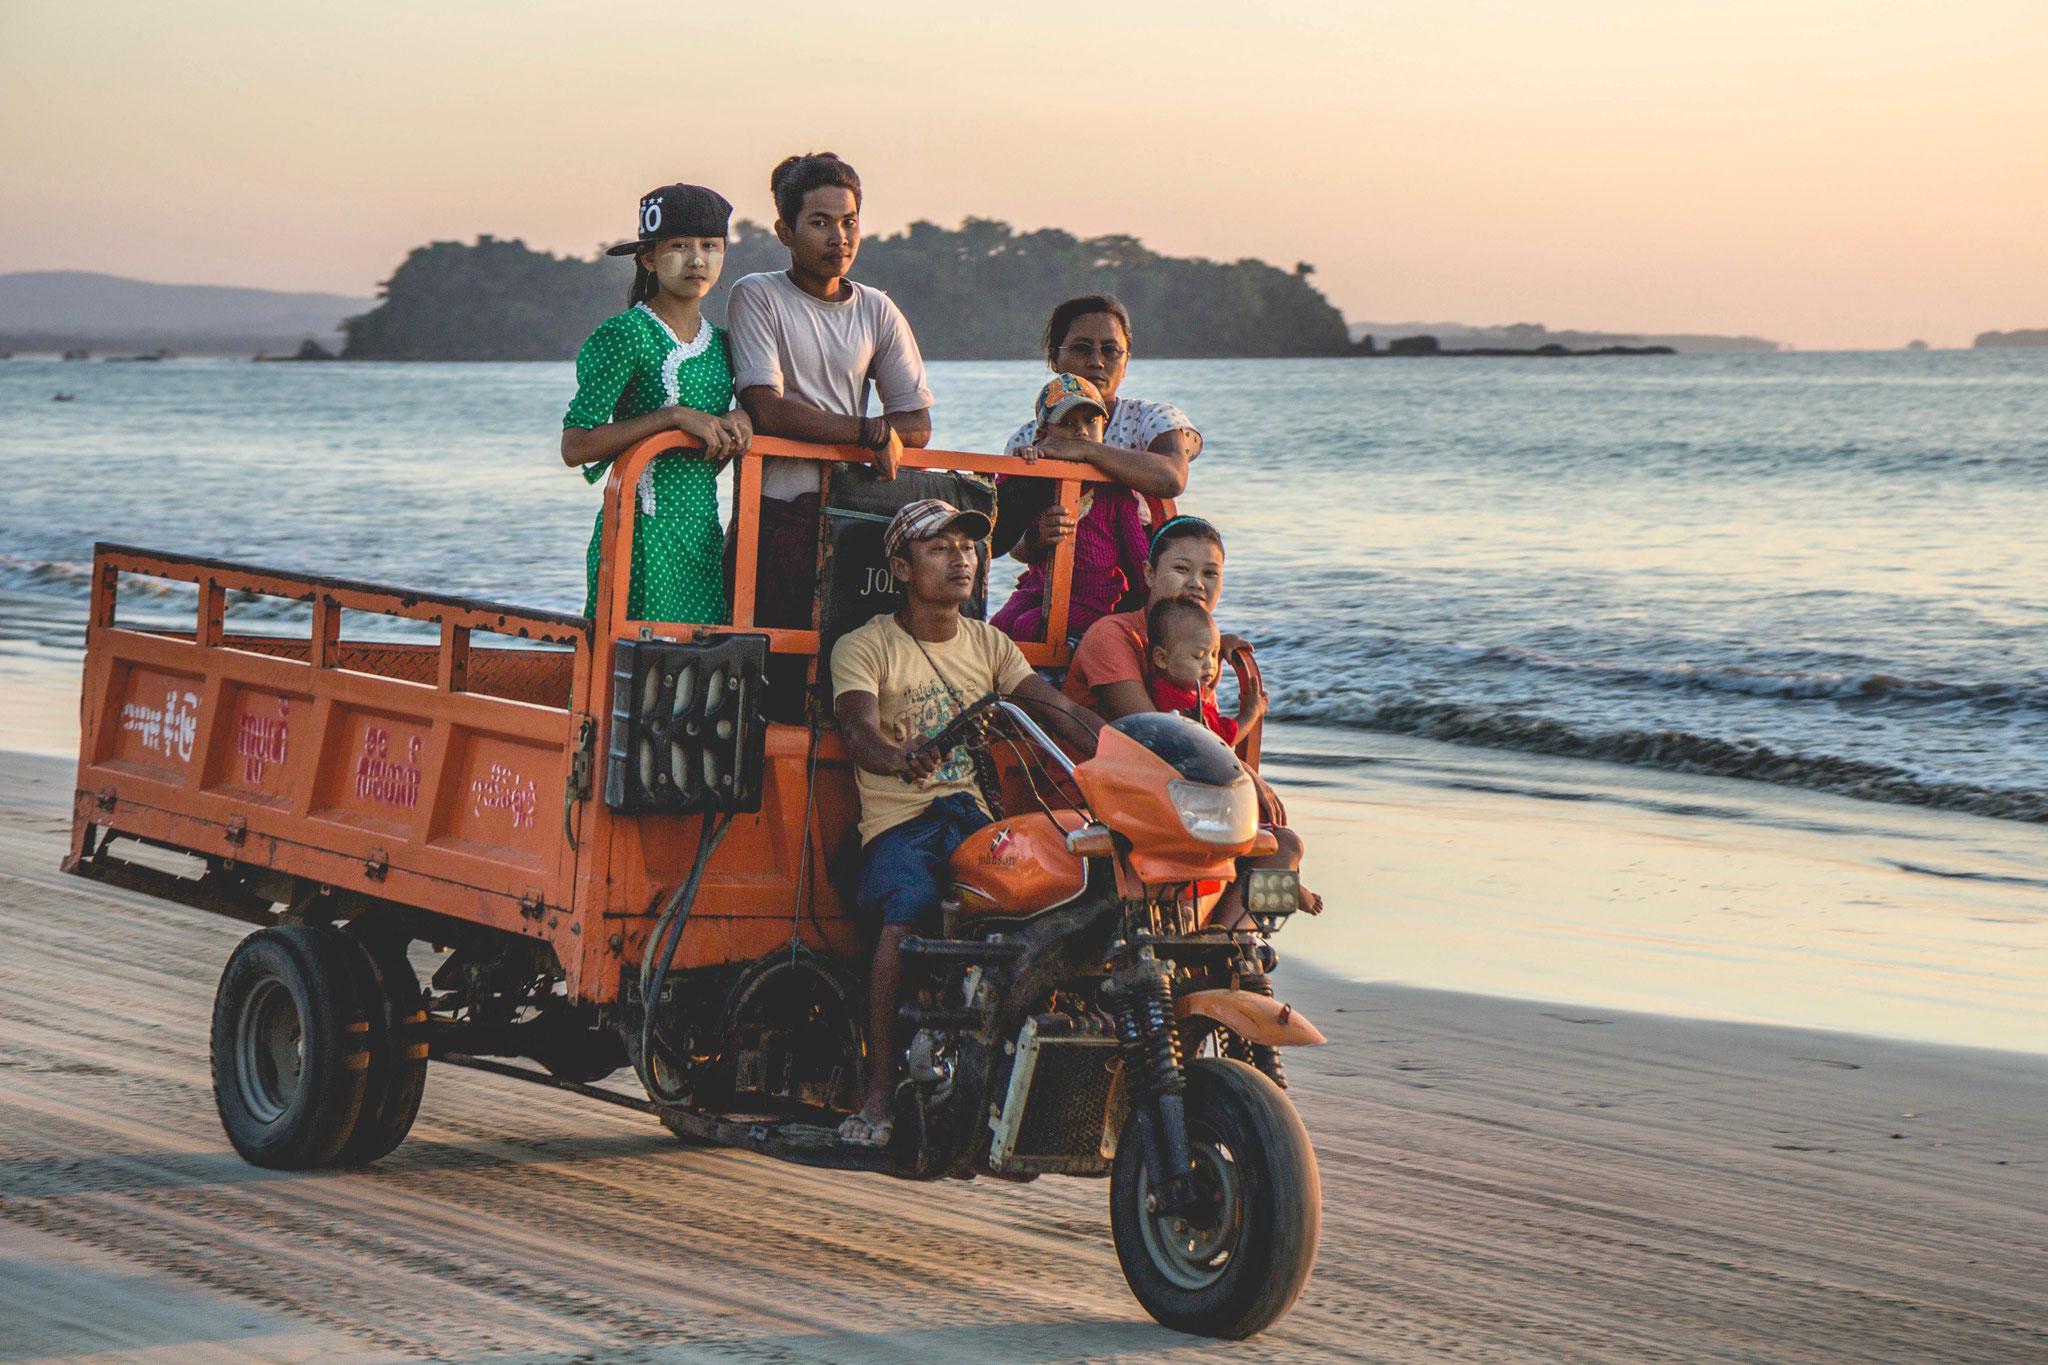 Ngwesaung Beach, Myanmar 2016